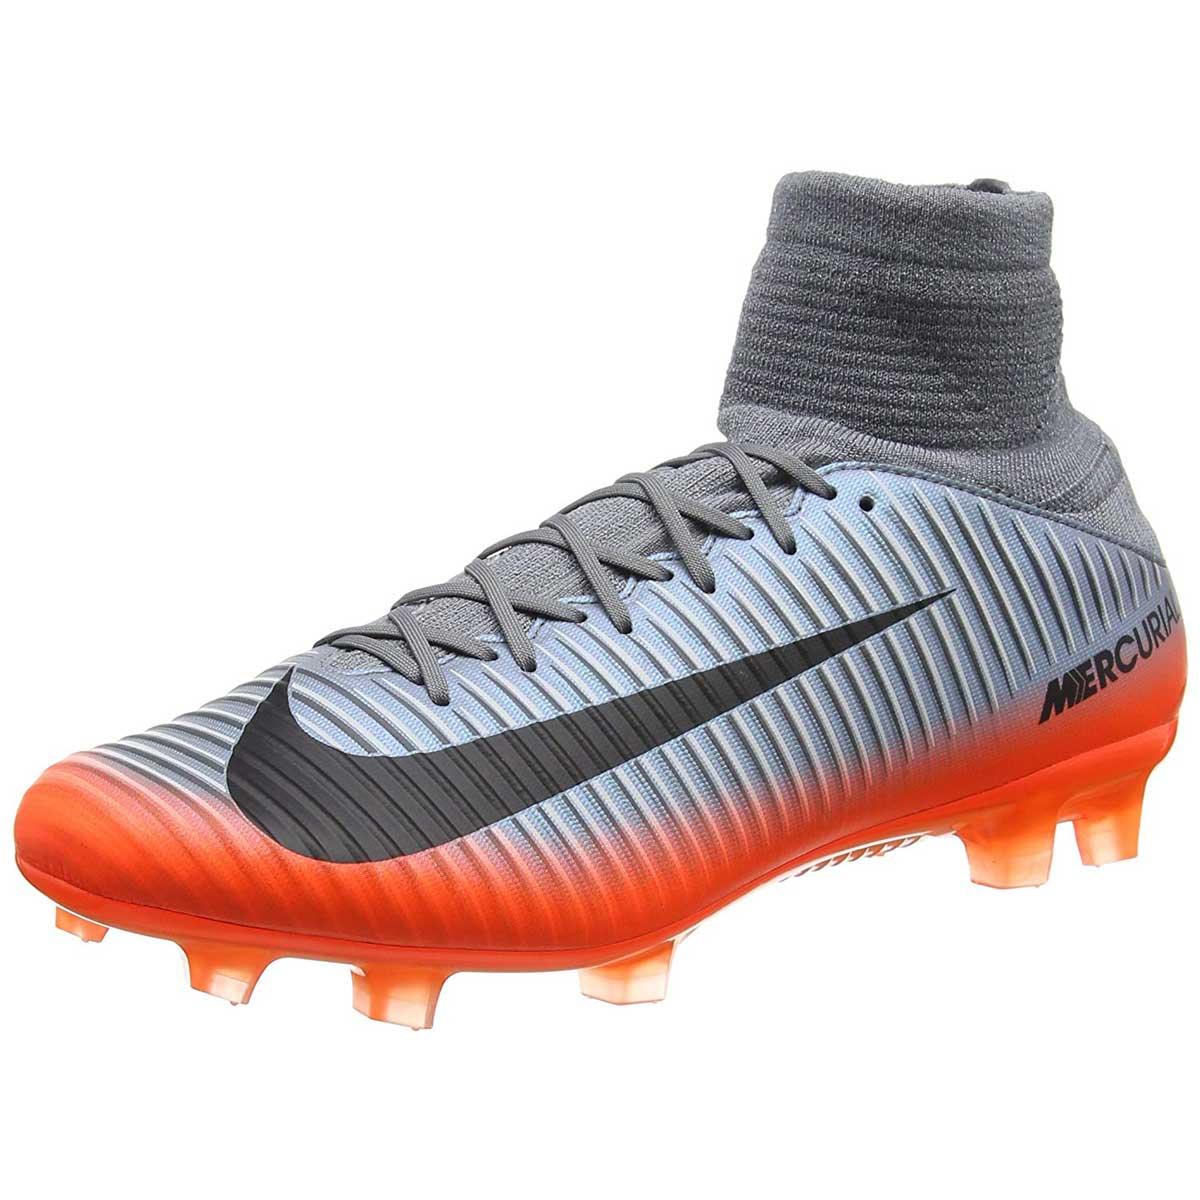 nike football cr7 shoes